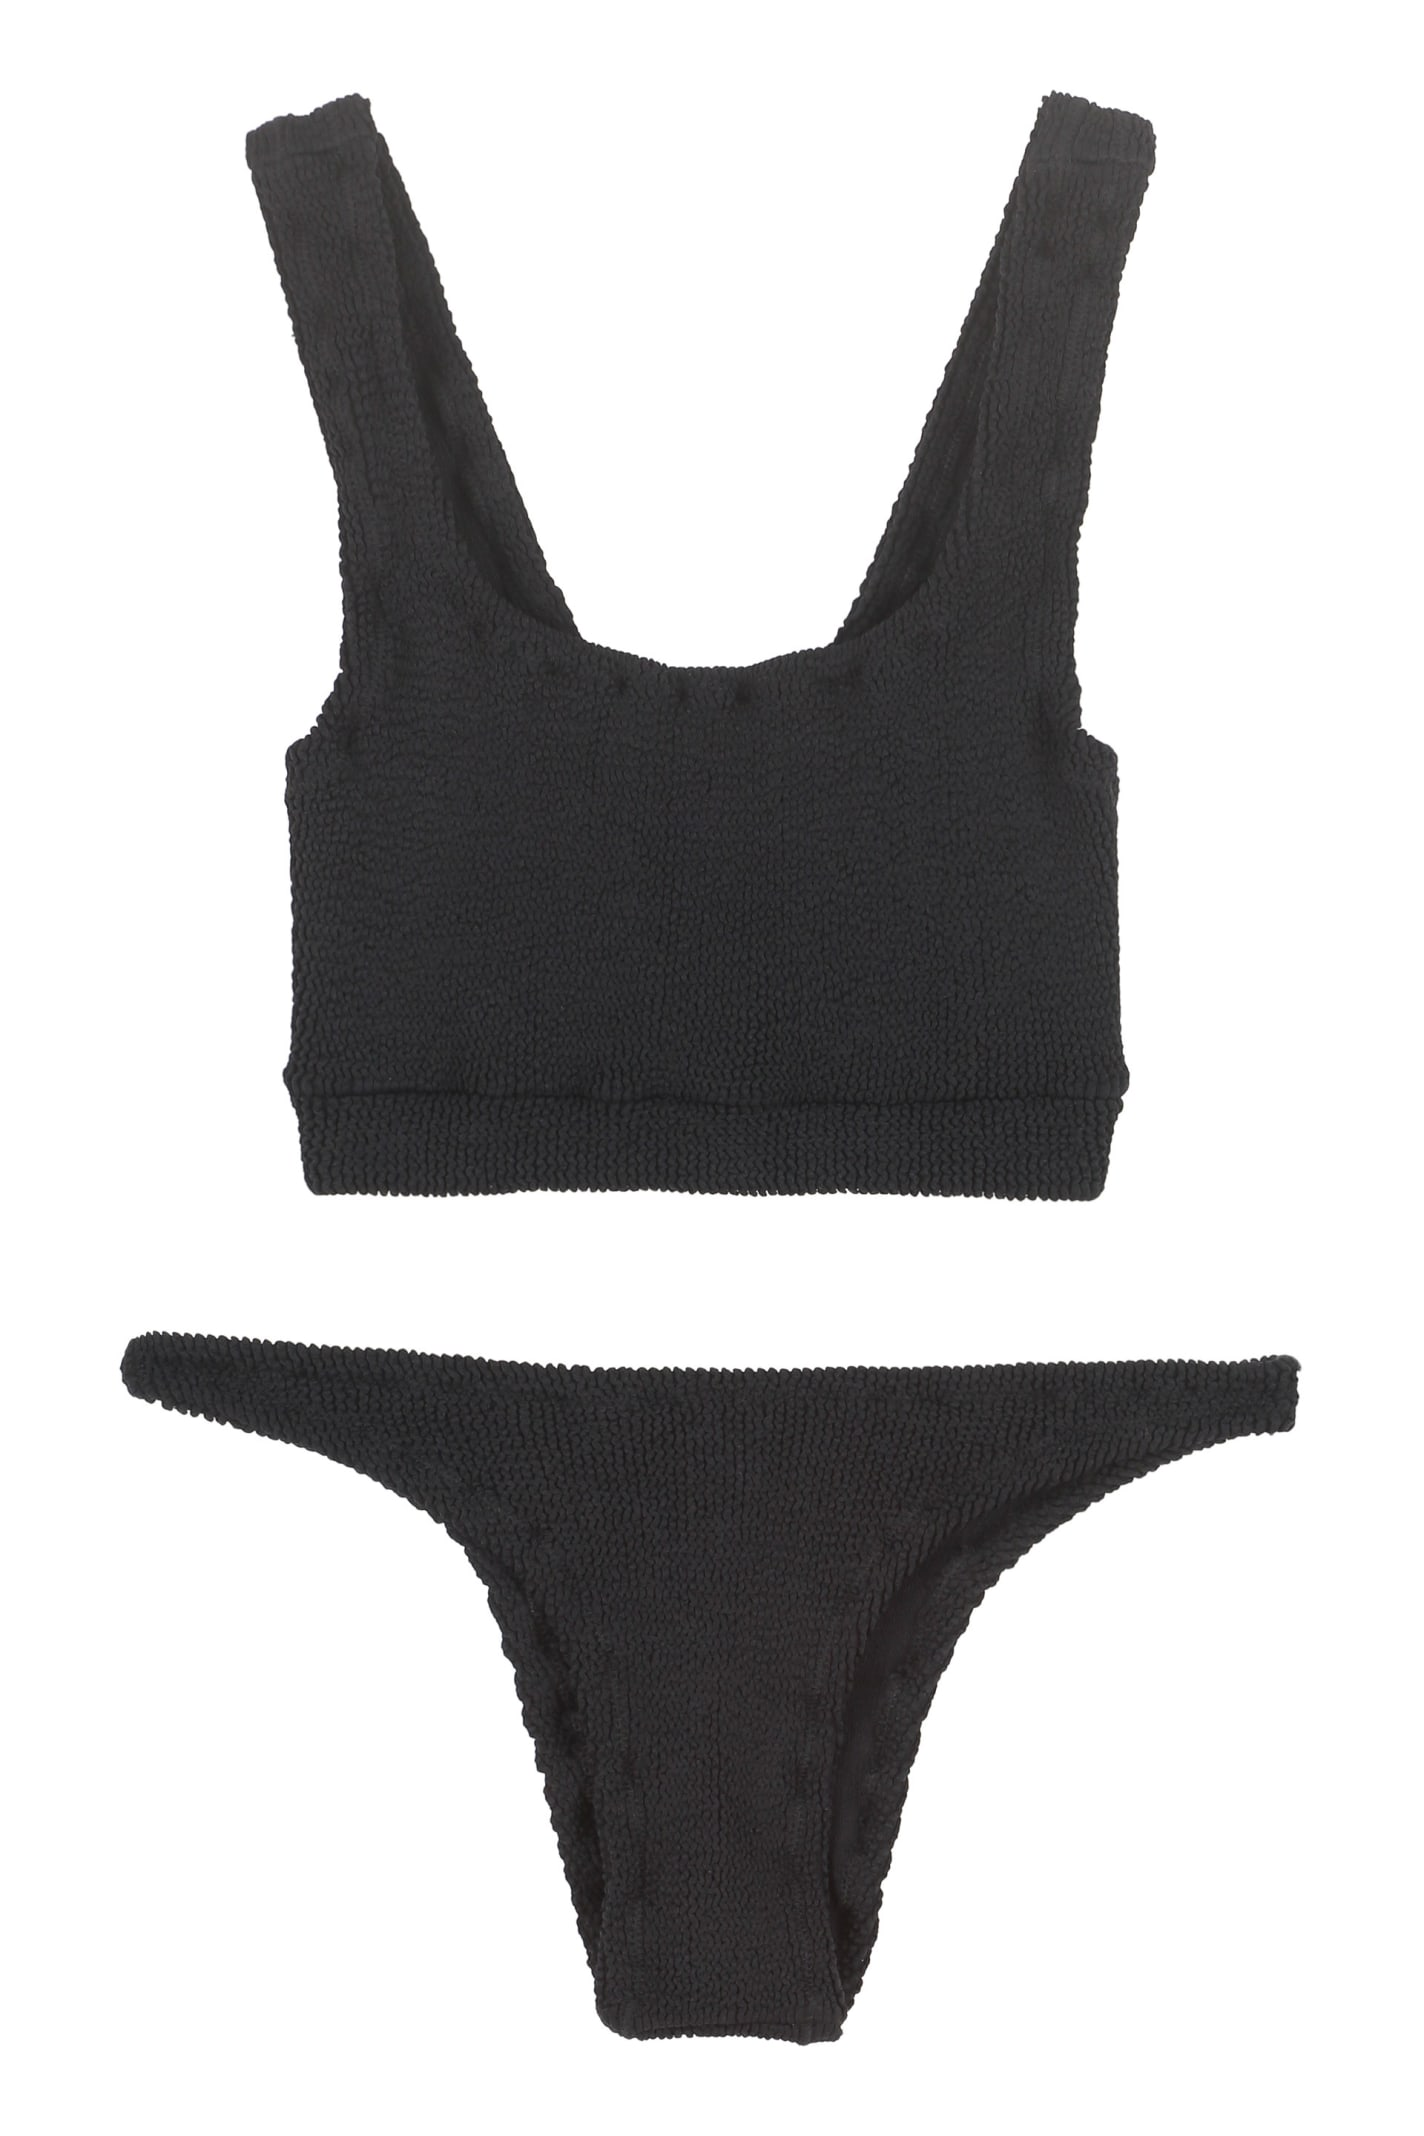 Reina Olga Ginny Boobs Scrunch Bikini